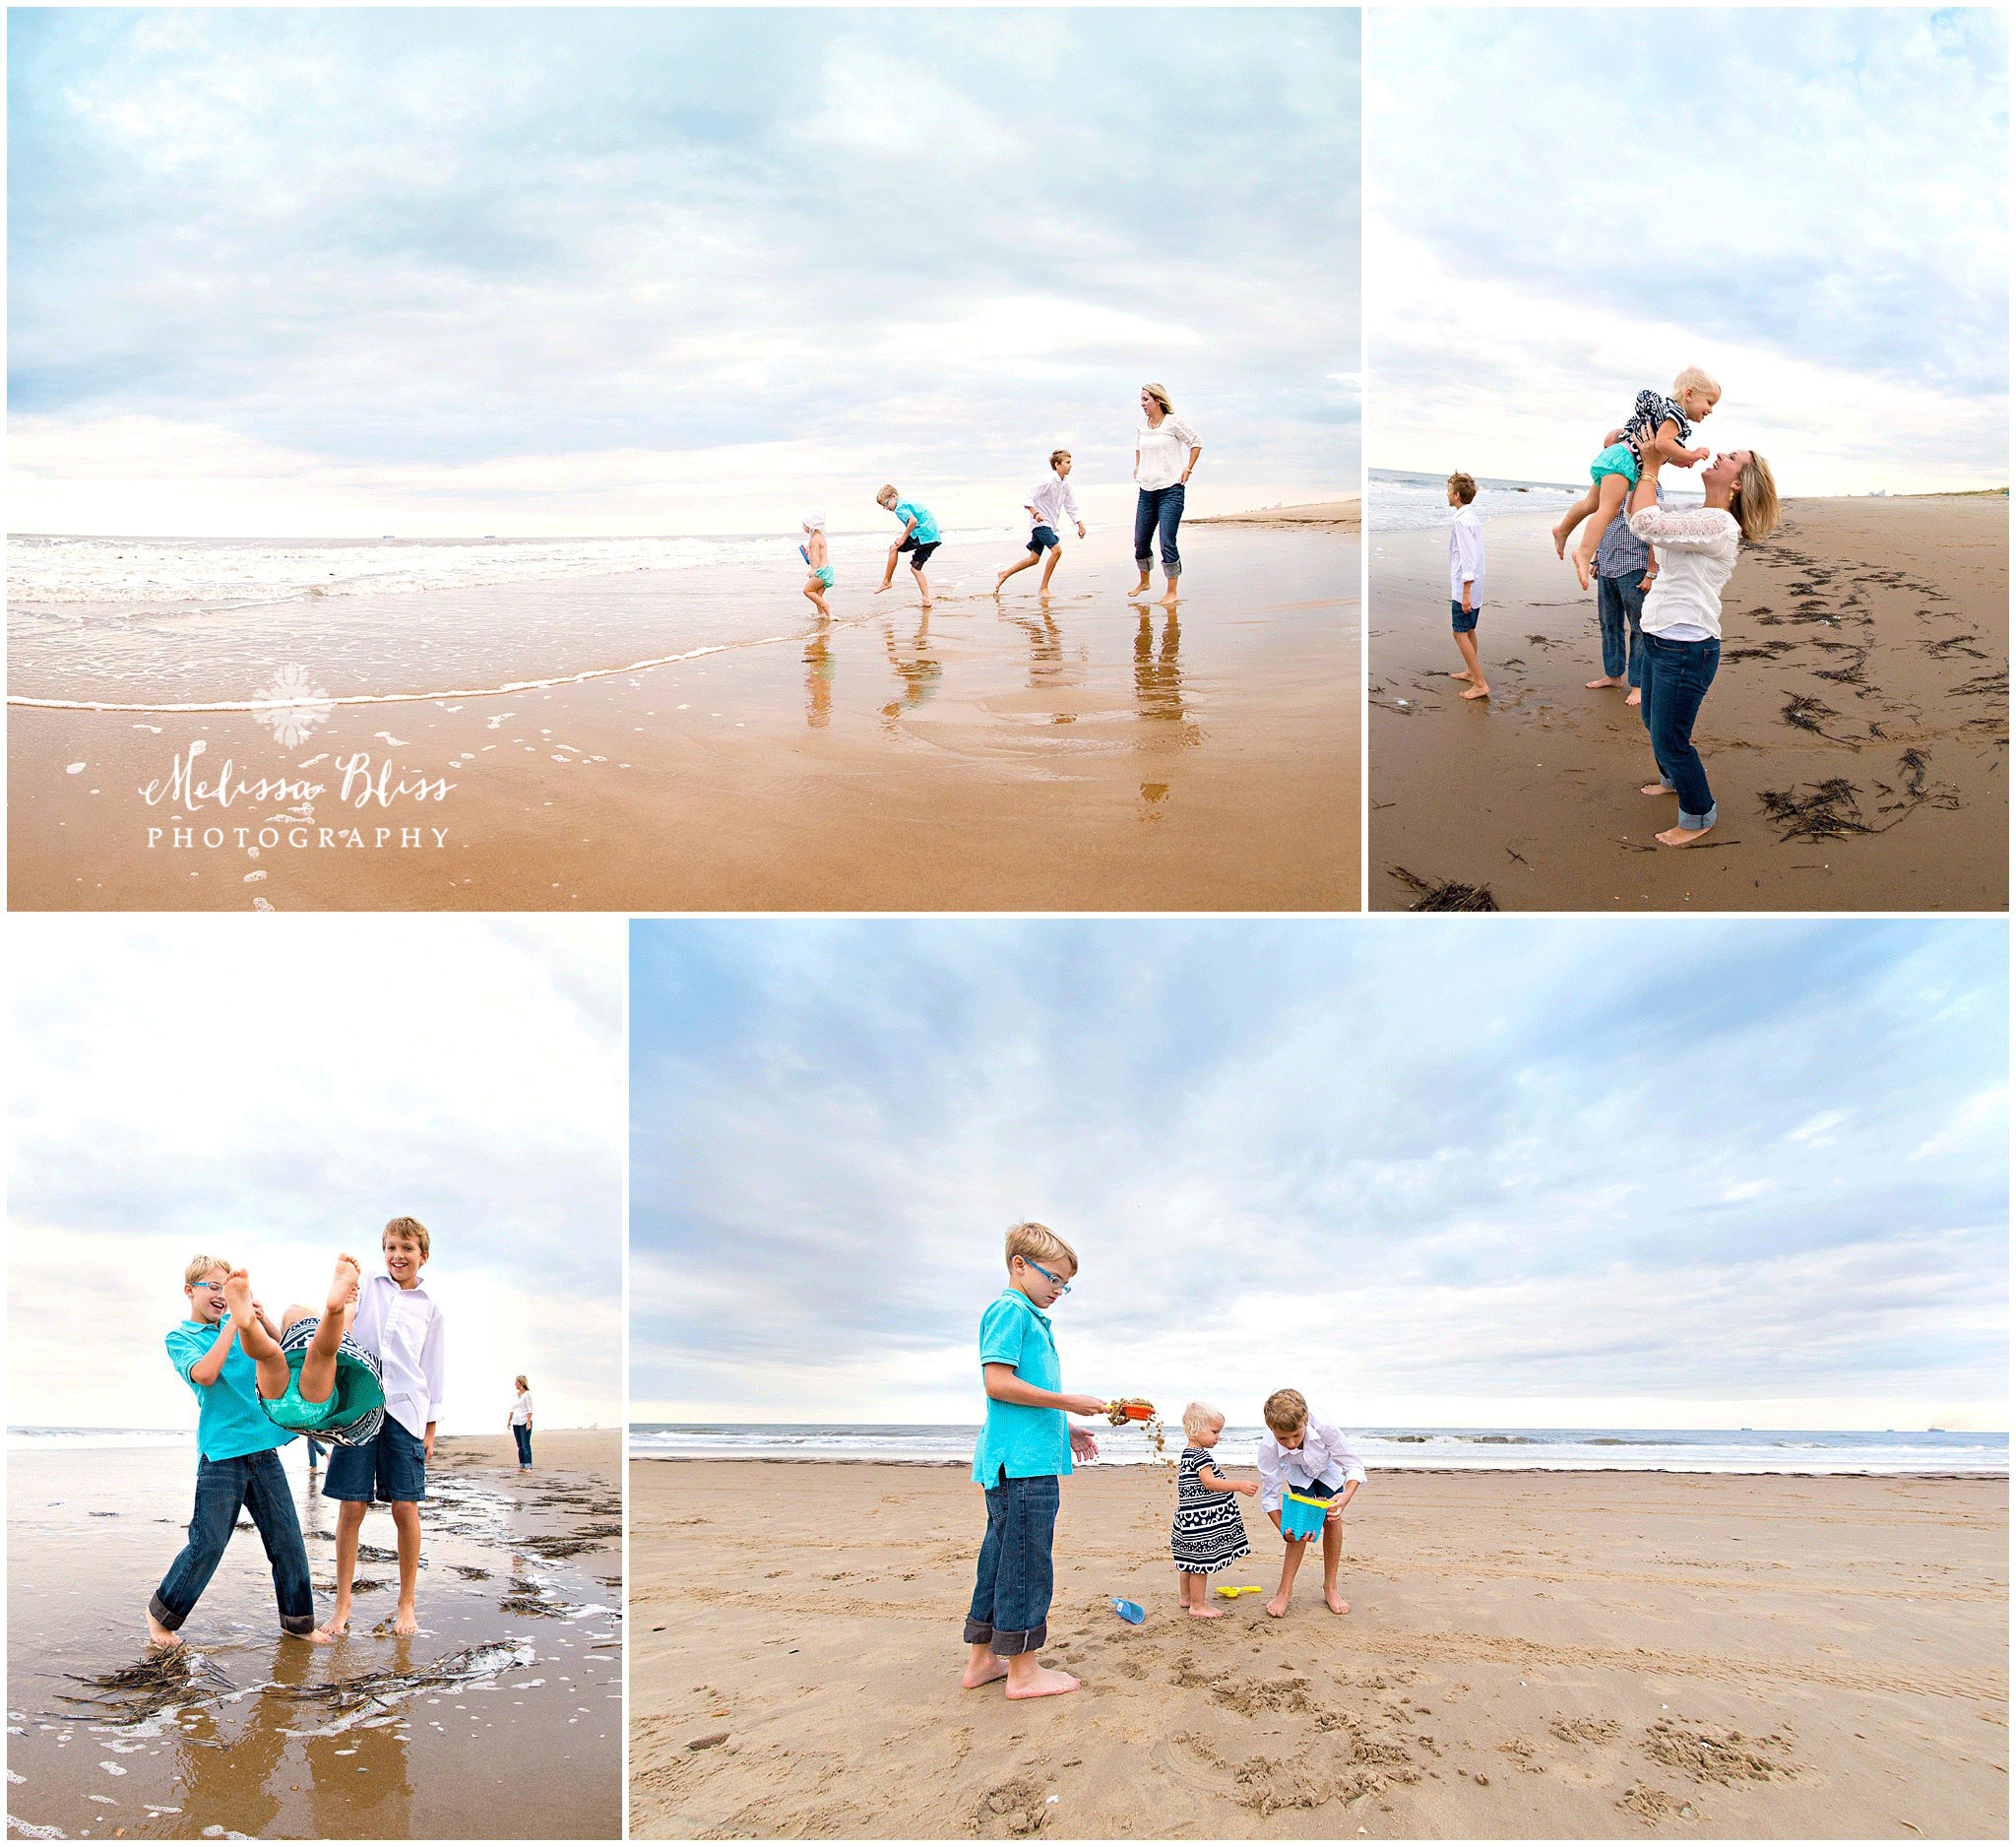 virginia-beach-sandbrige-professional-photographers-melissa-bliss-photography-family-beach-session